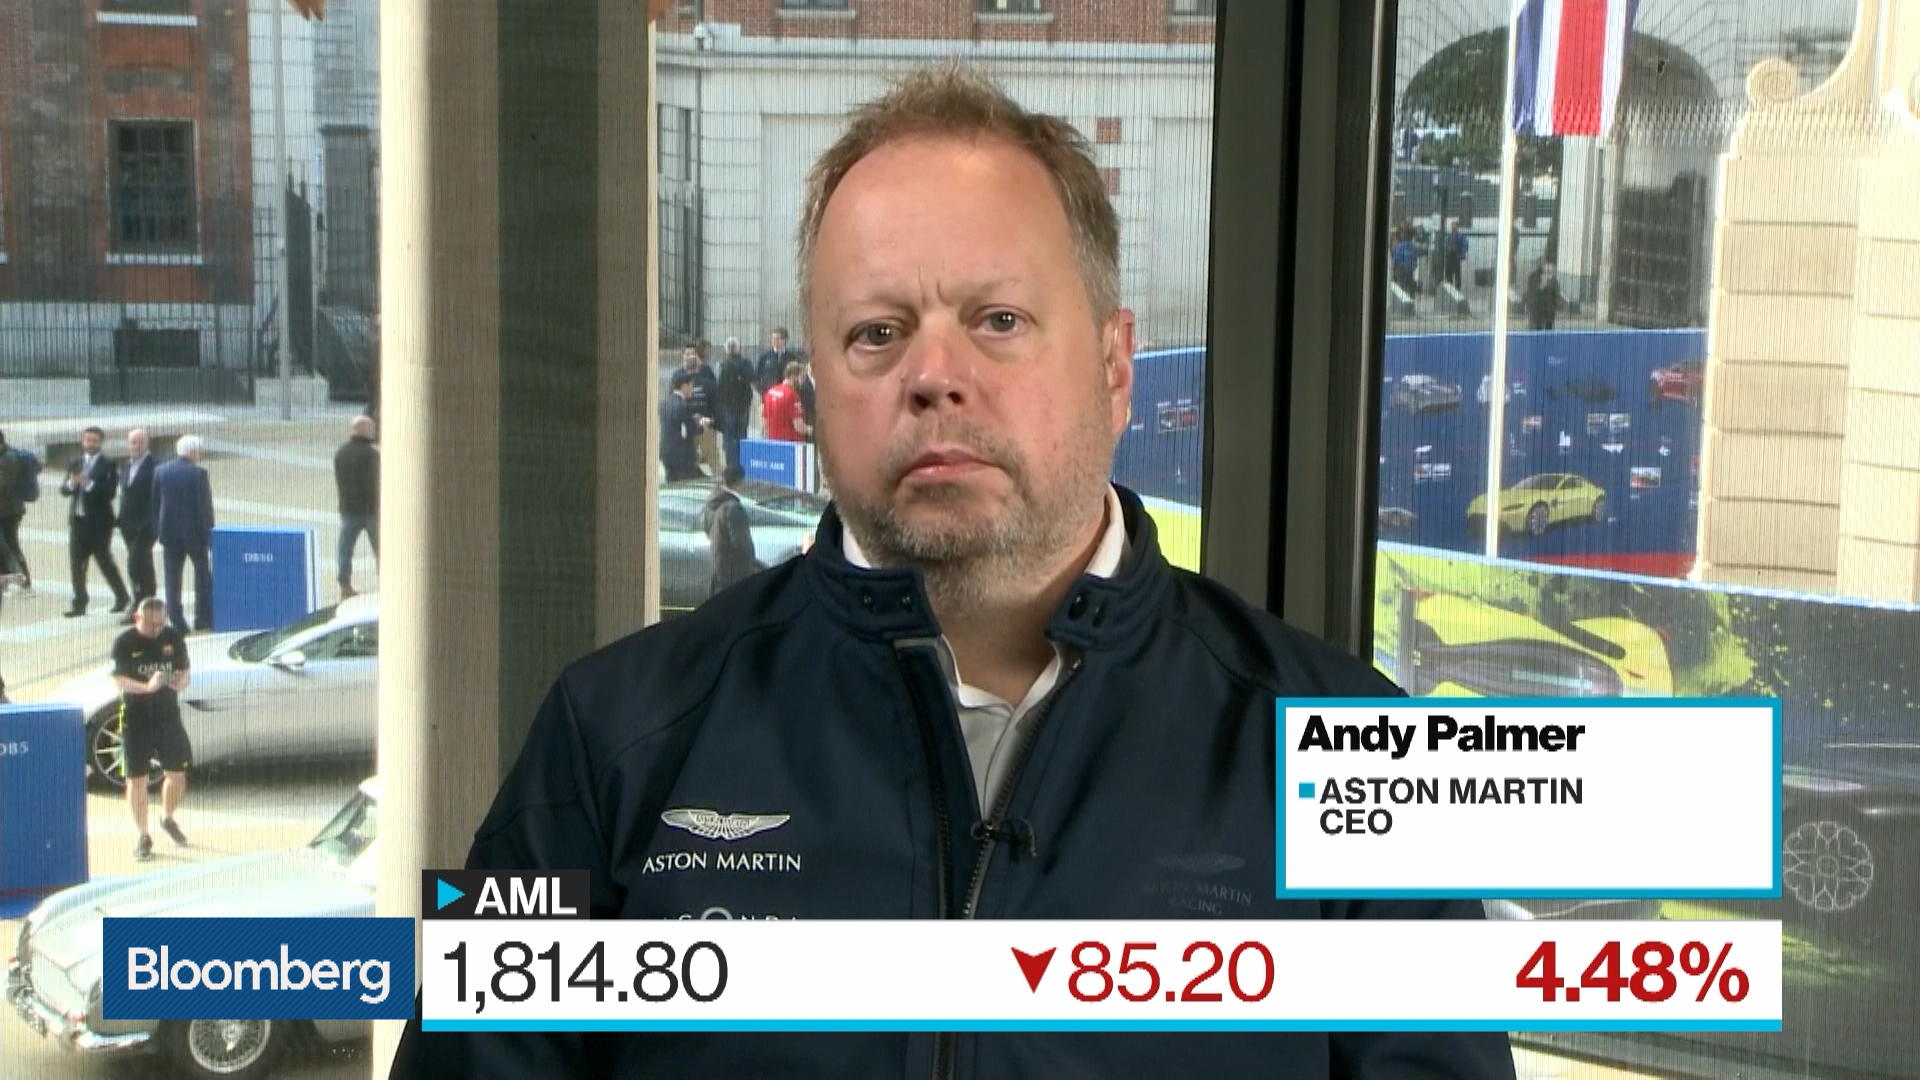 Aston Martin Stock >> Aston Martin S Trading Debut Flops As Shares Fall After Open